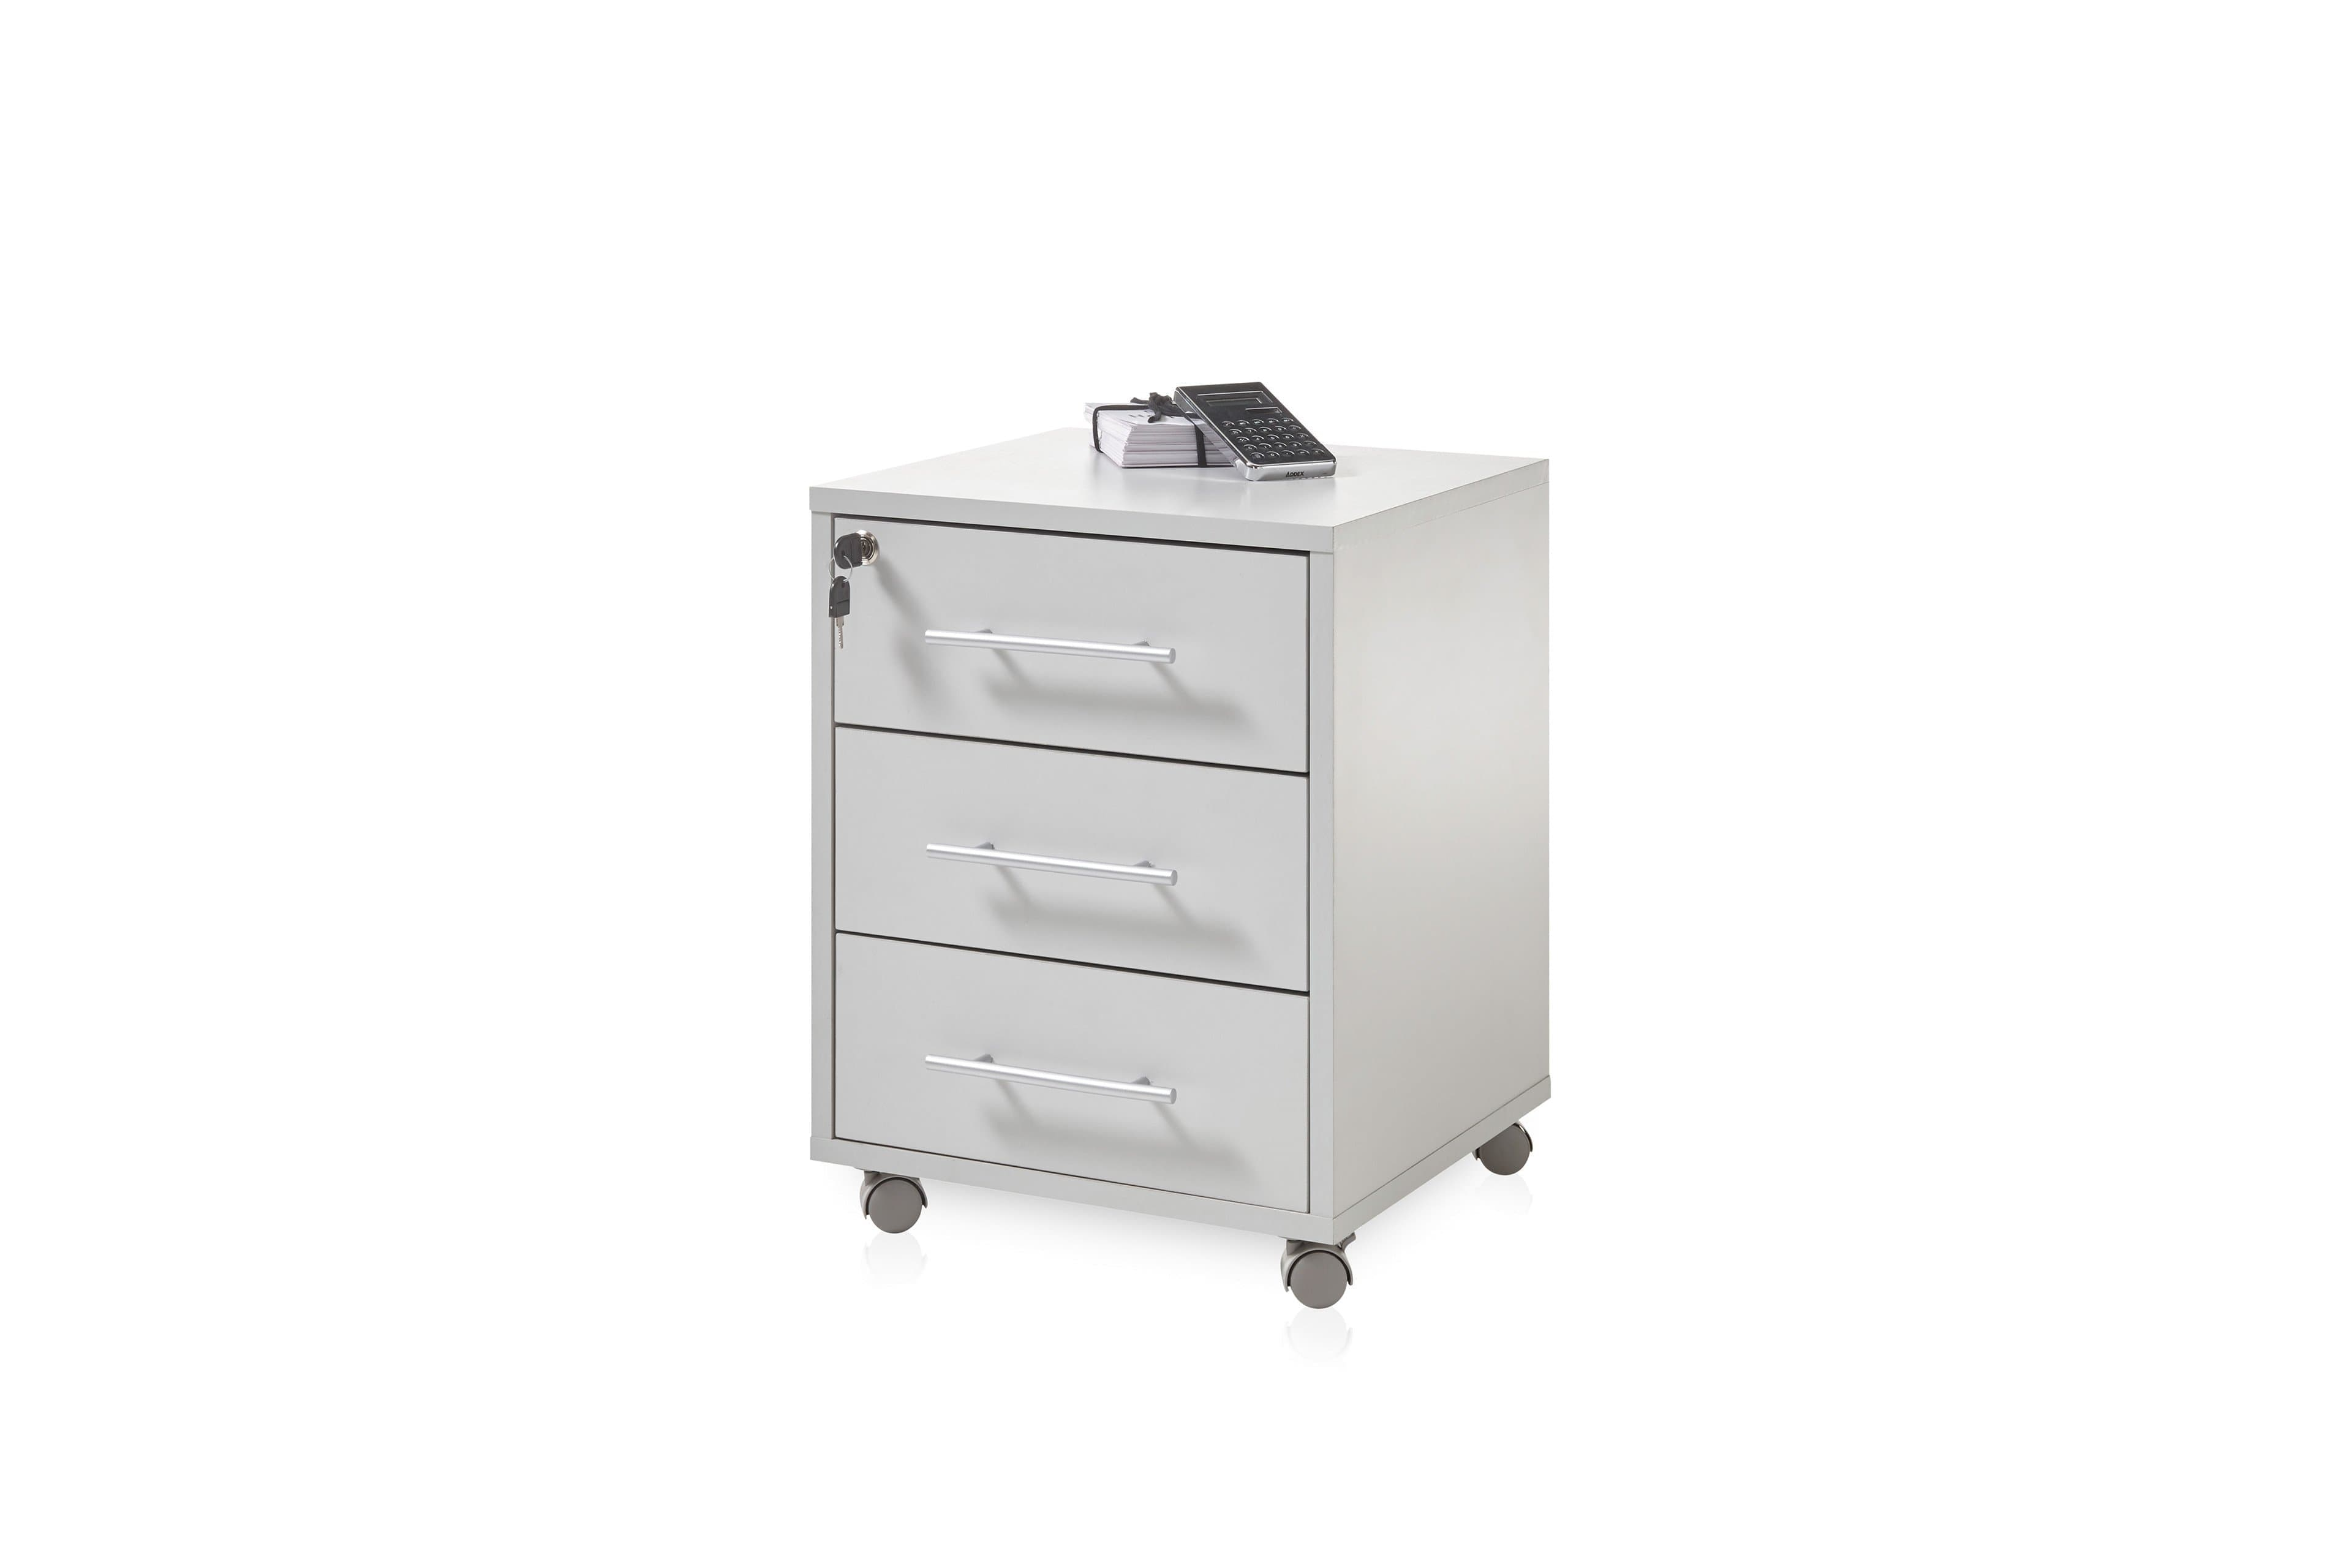 Cabinet din pal pe rotile, cu 3 sertare Prato Gri deschis, l43xA46xH56 cm poza